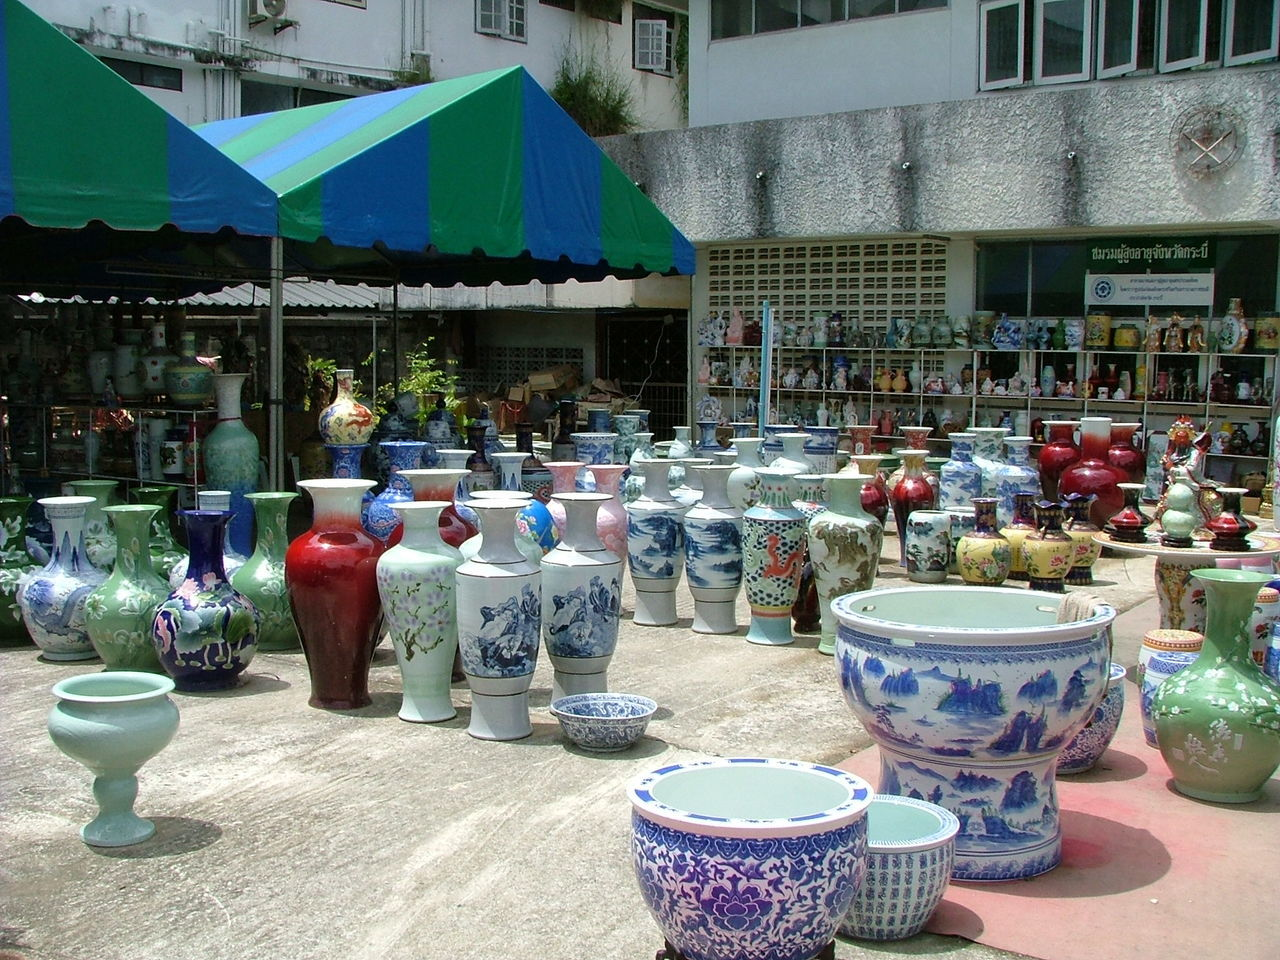 Asia. Building Exterior Built Structure Colourful Vases. Holidays Market Market Market Stall Oriental Porcelain Vases. Porcelain Vases. Shopping Tourism. Variation Vases.